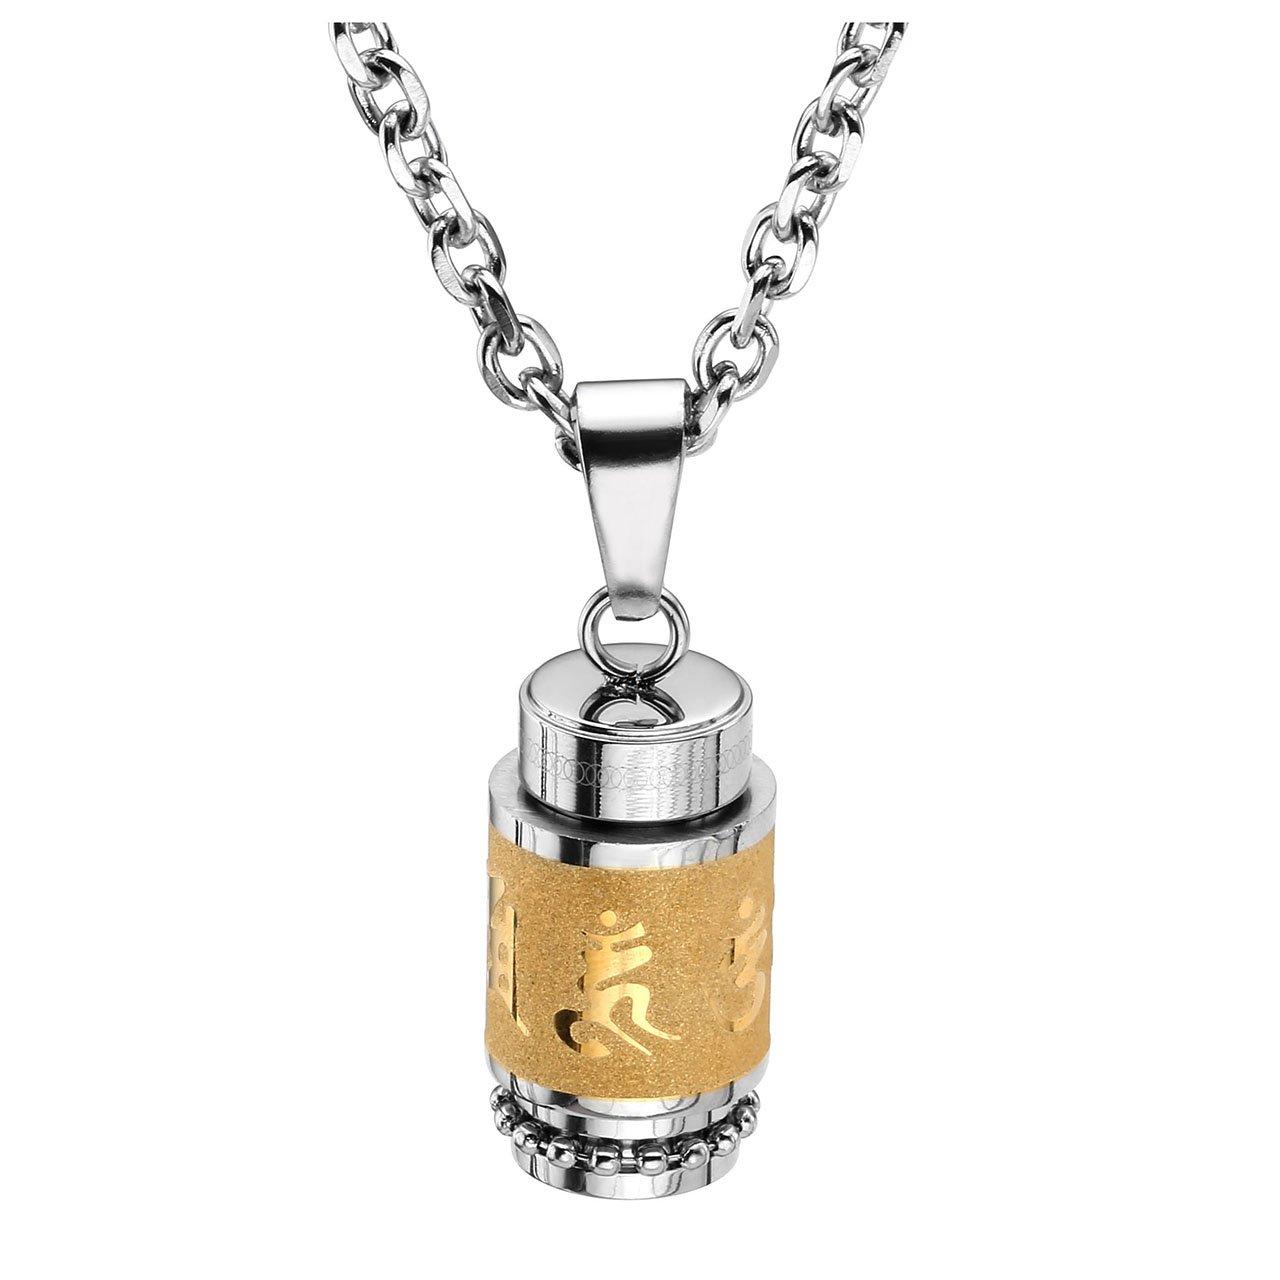 Jovivi Stainless Steel Buddhist Om Mani Padme Hum Prayer Wheel Bottle Keepsake Urn Necklace Memorial Jewelry